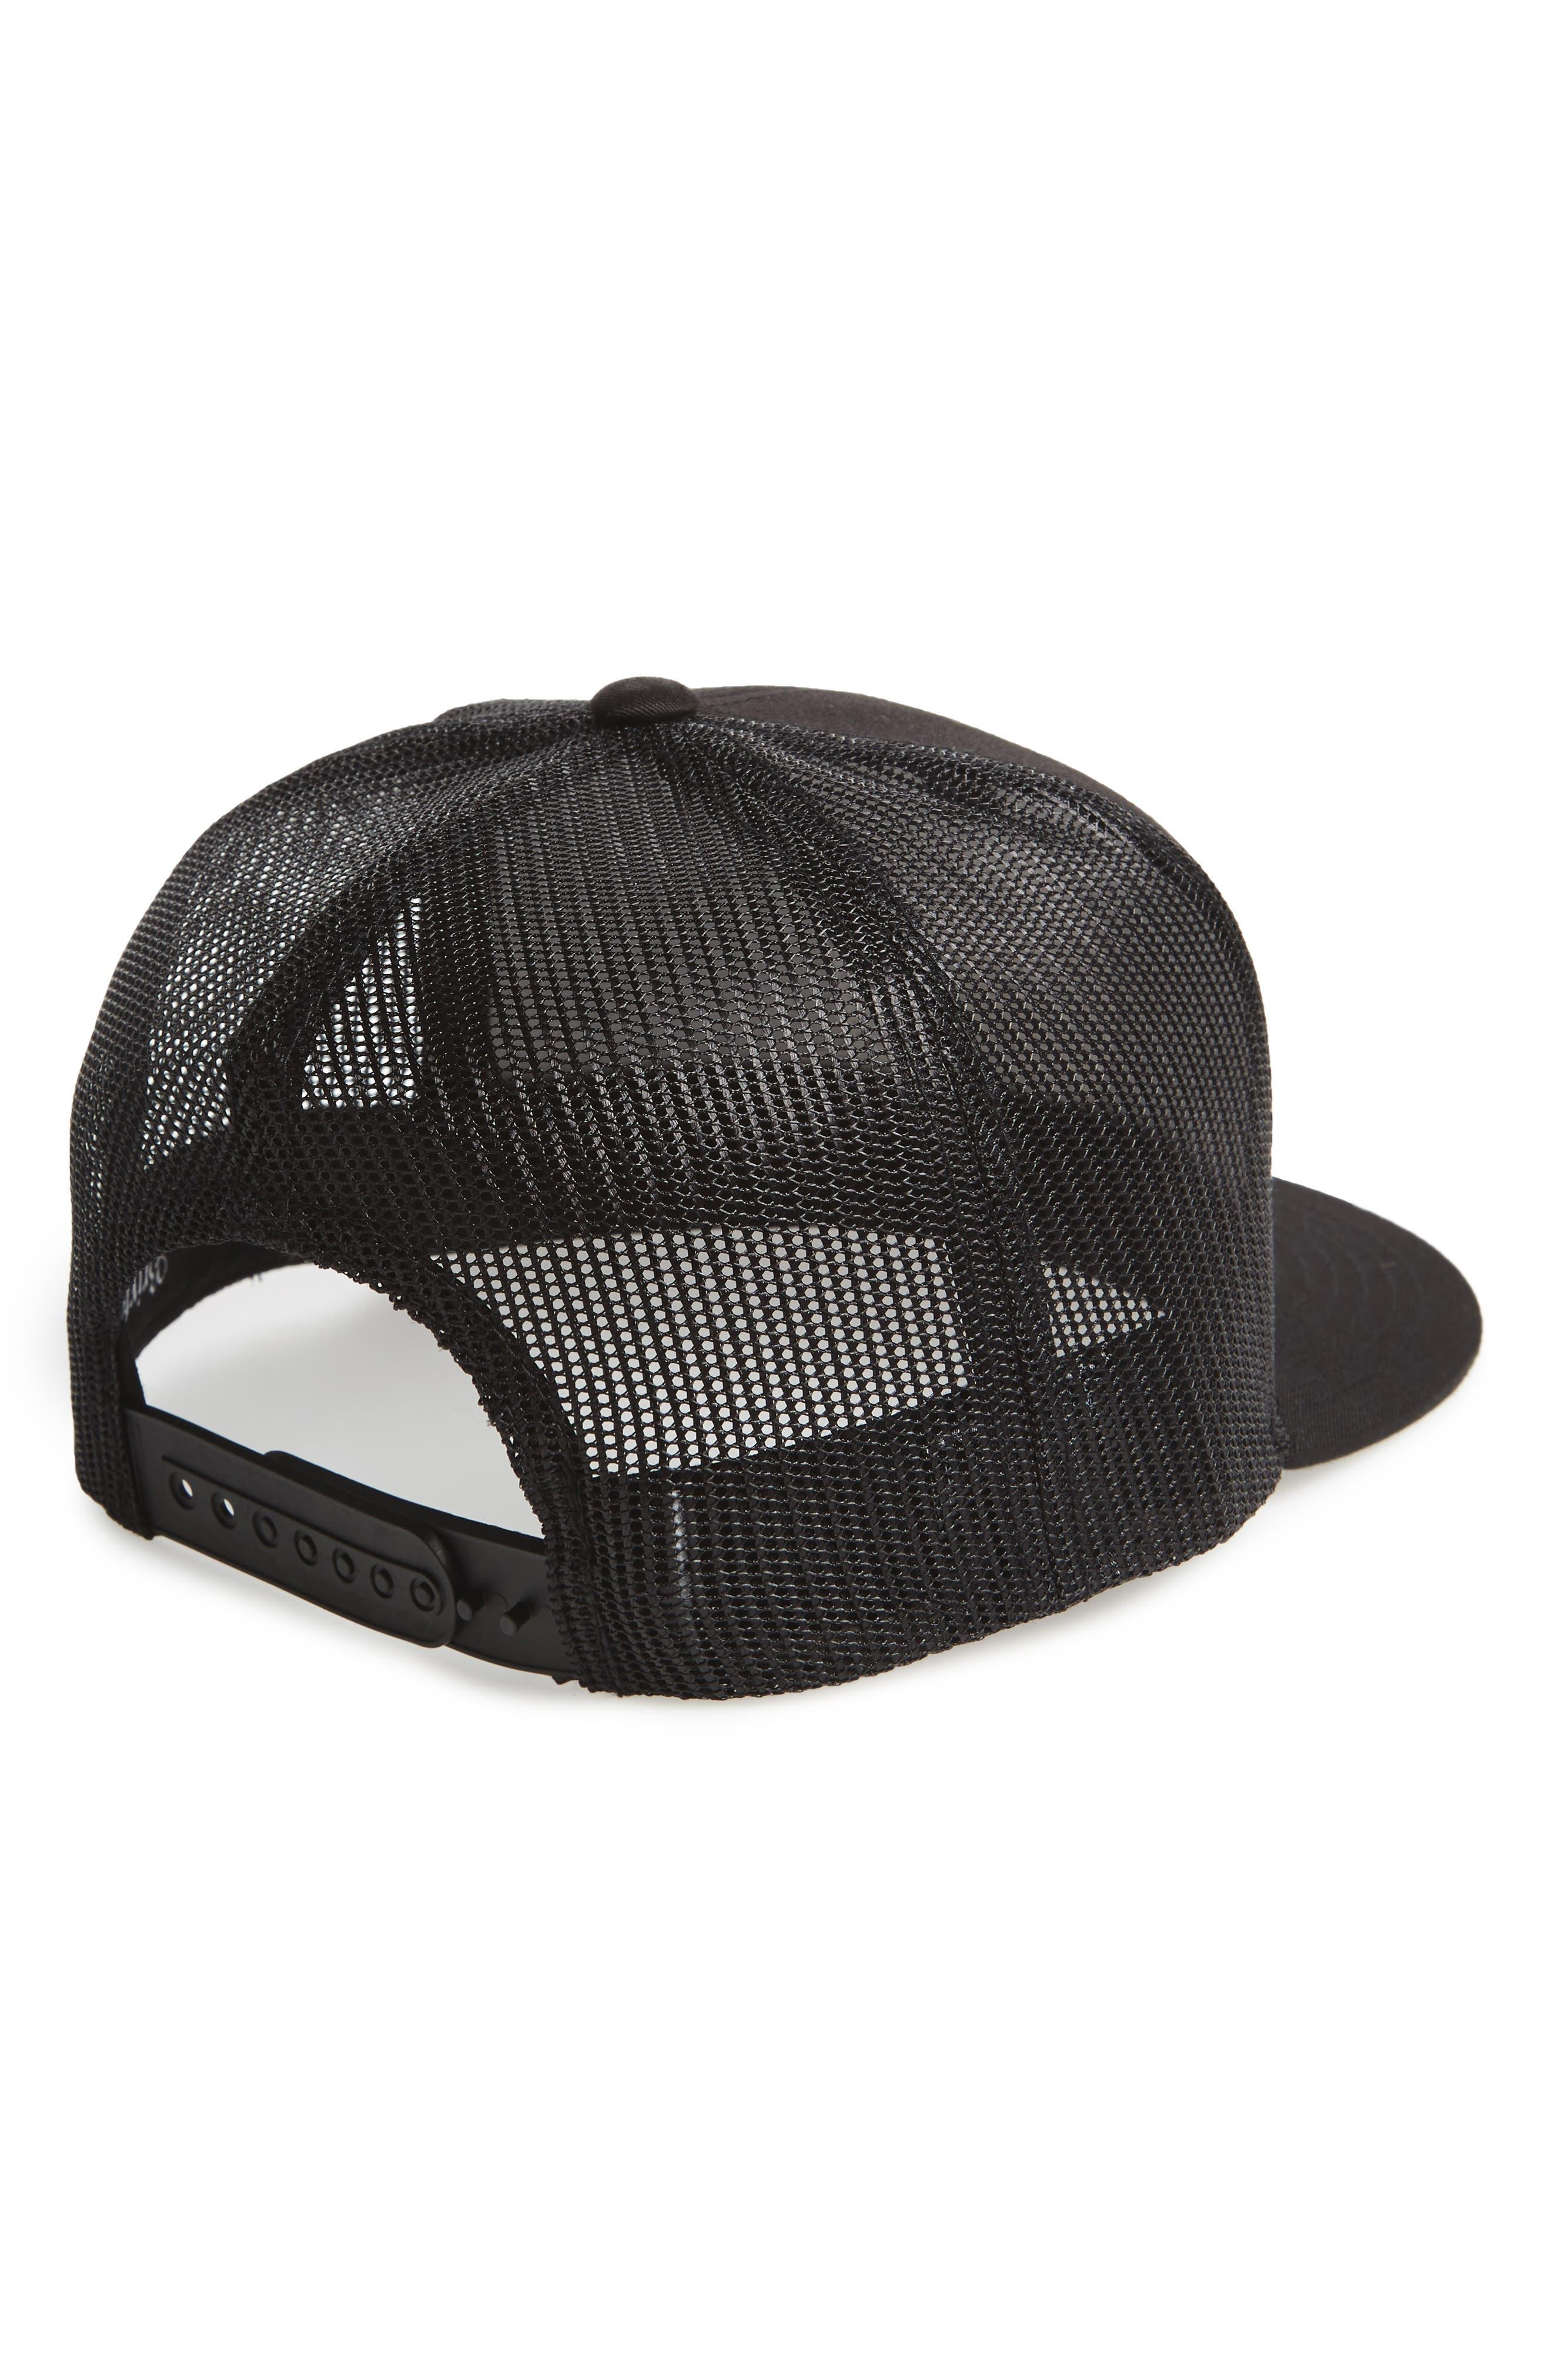 'Brood' Snapback Cap,                             Alternate thumbnail 3, color,                             BLACK/ BLACK